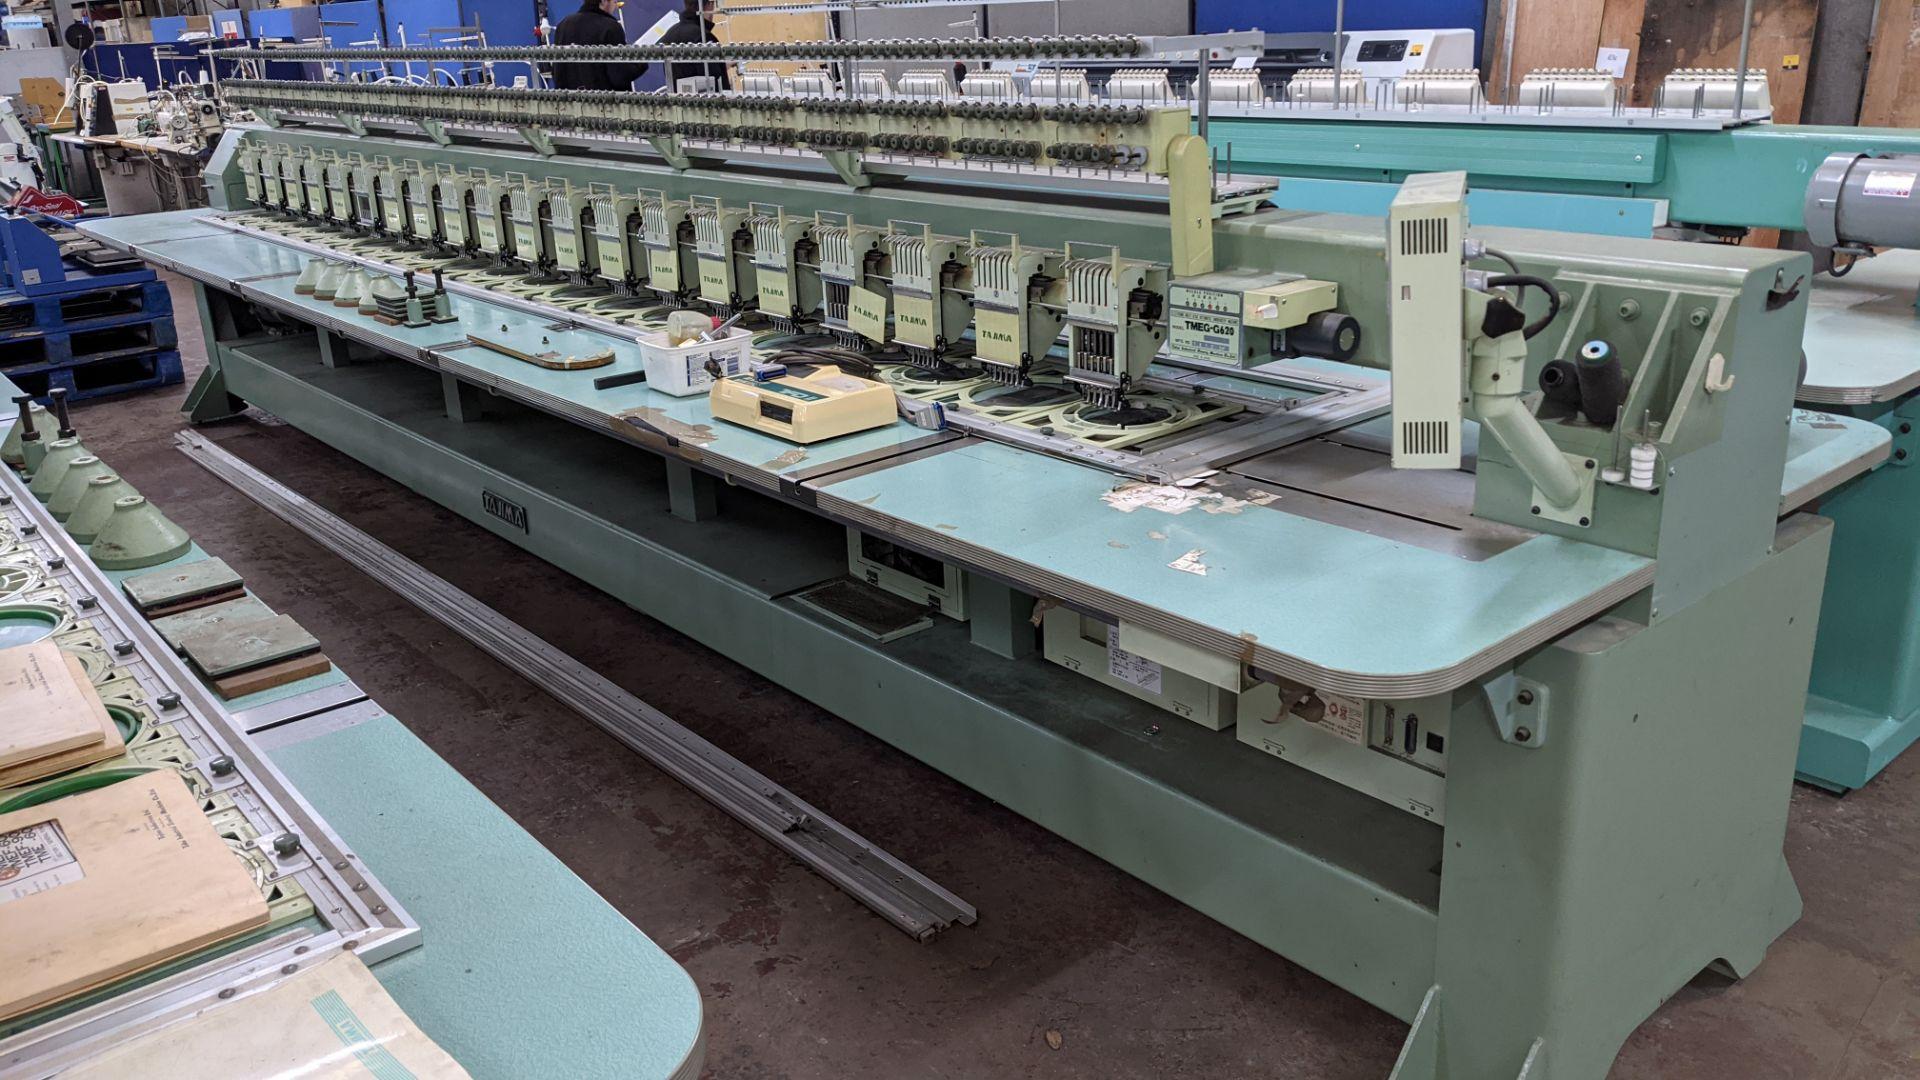 Tokai Tajima electronic 20 head automatic embroidery machine model TMEG-G620, manufacturing number 7 - Image 2 of 19